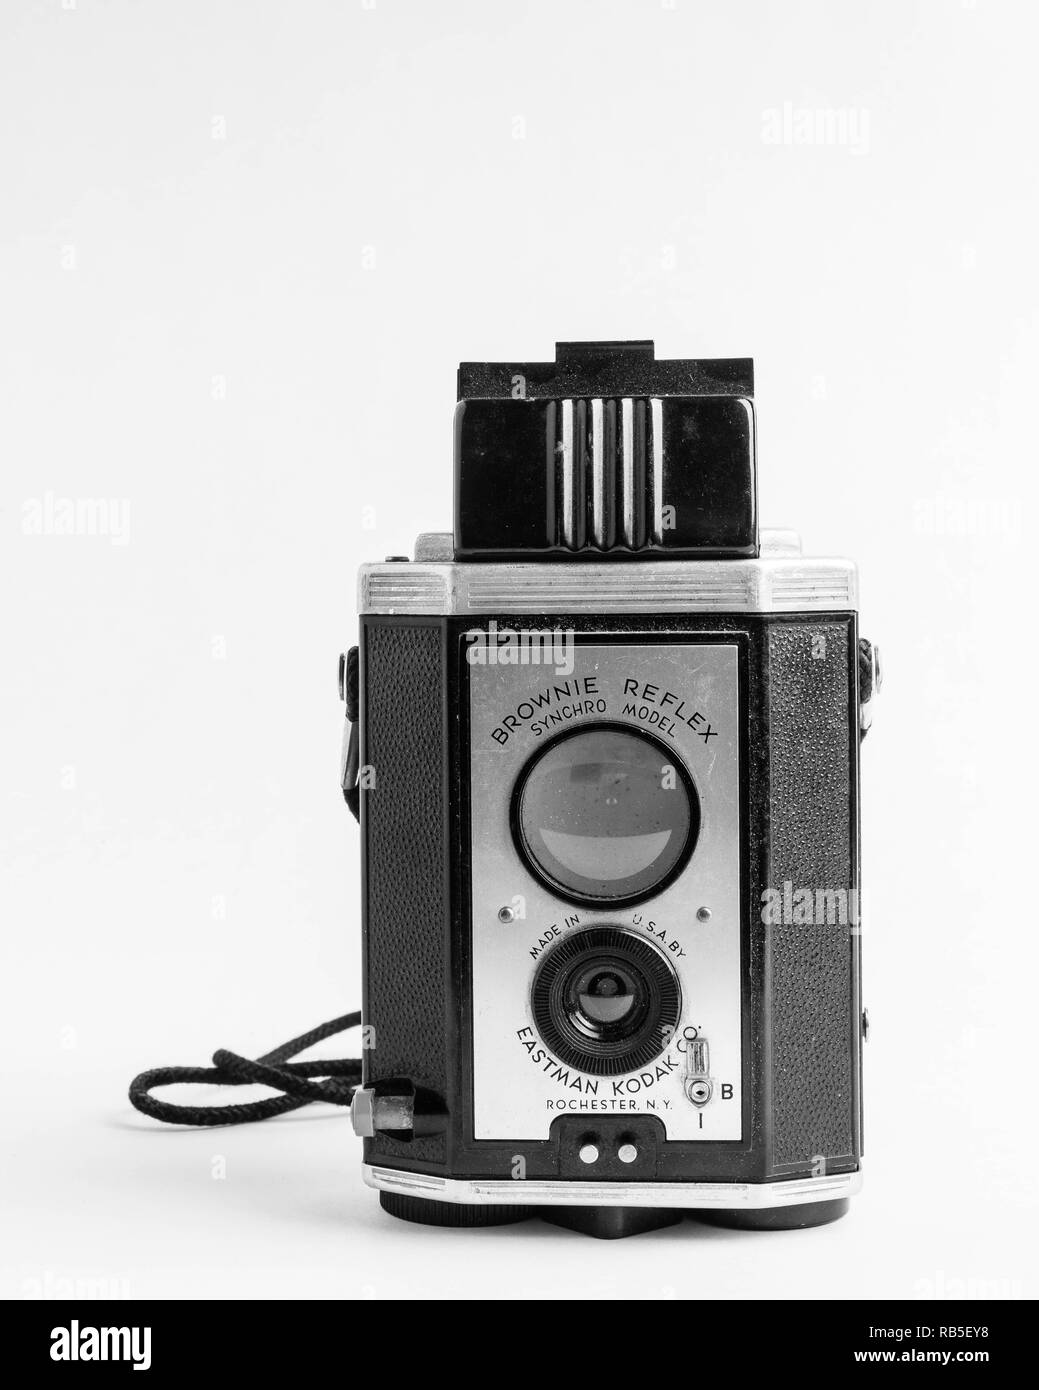 Vintage Eastman Kodak Brownie Reflex Synchro Model Film Camera - Stock Image